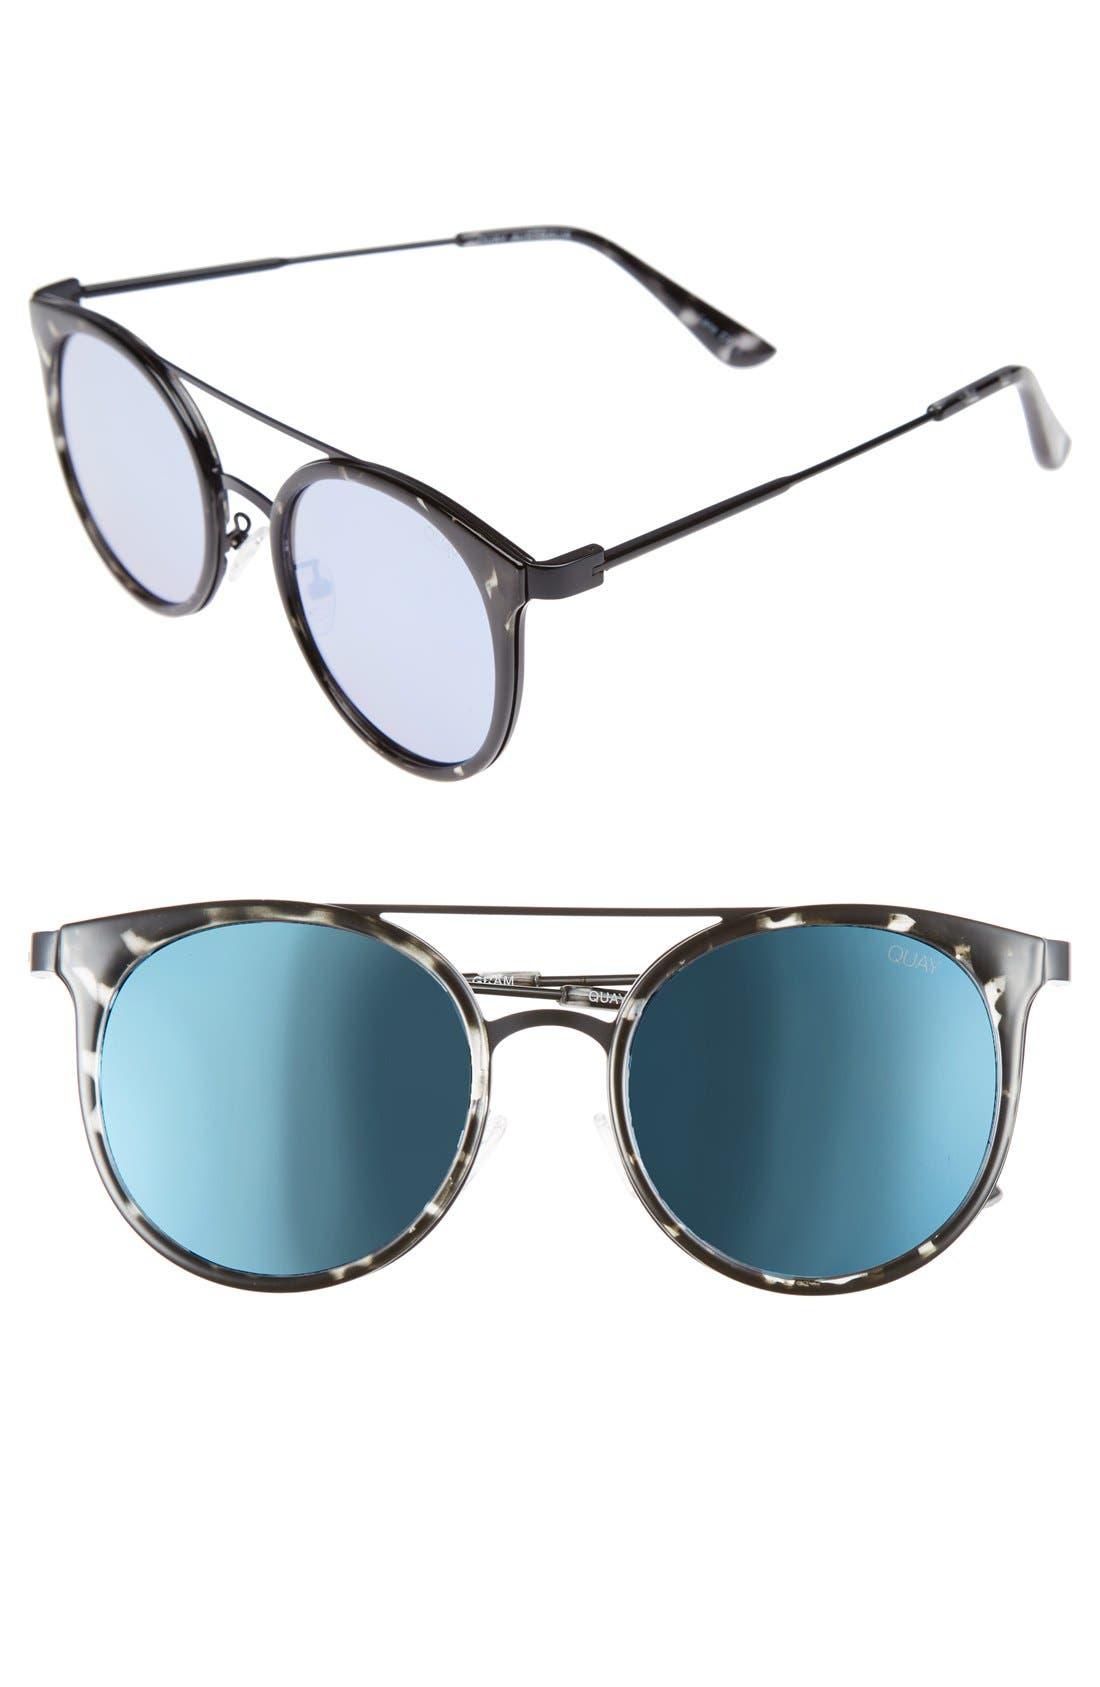 Kandy Gram 51mm Round Sunglasses,                         Main,                         color, Black Tort/ Blue